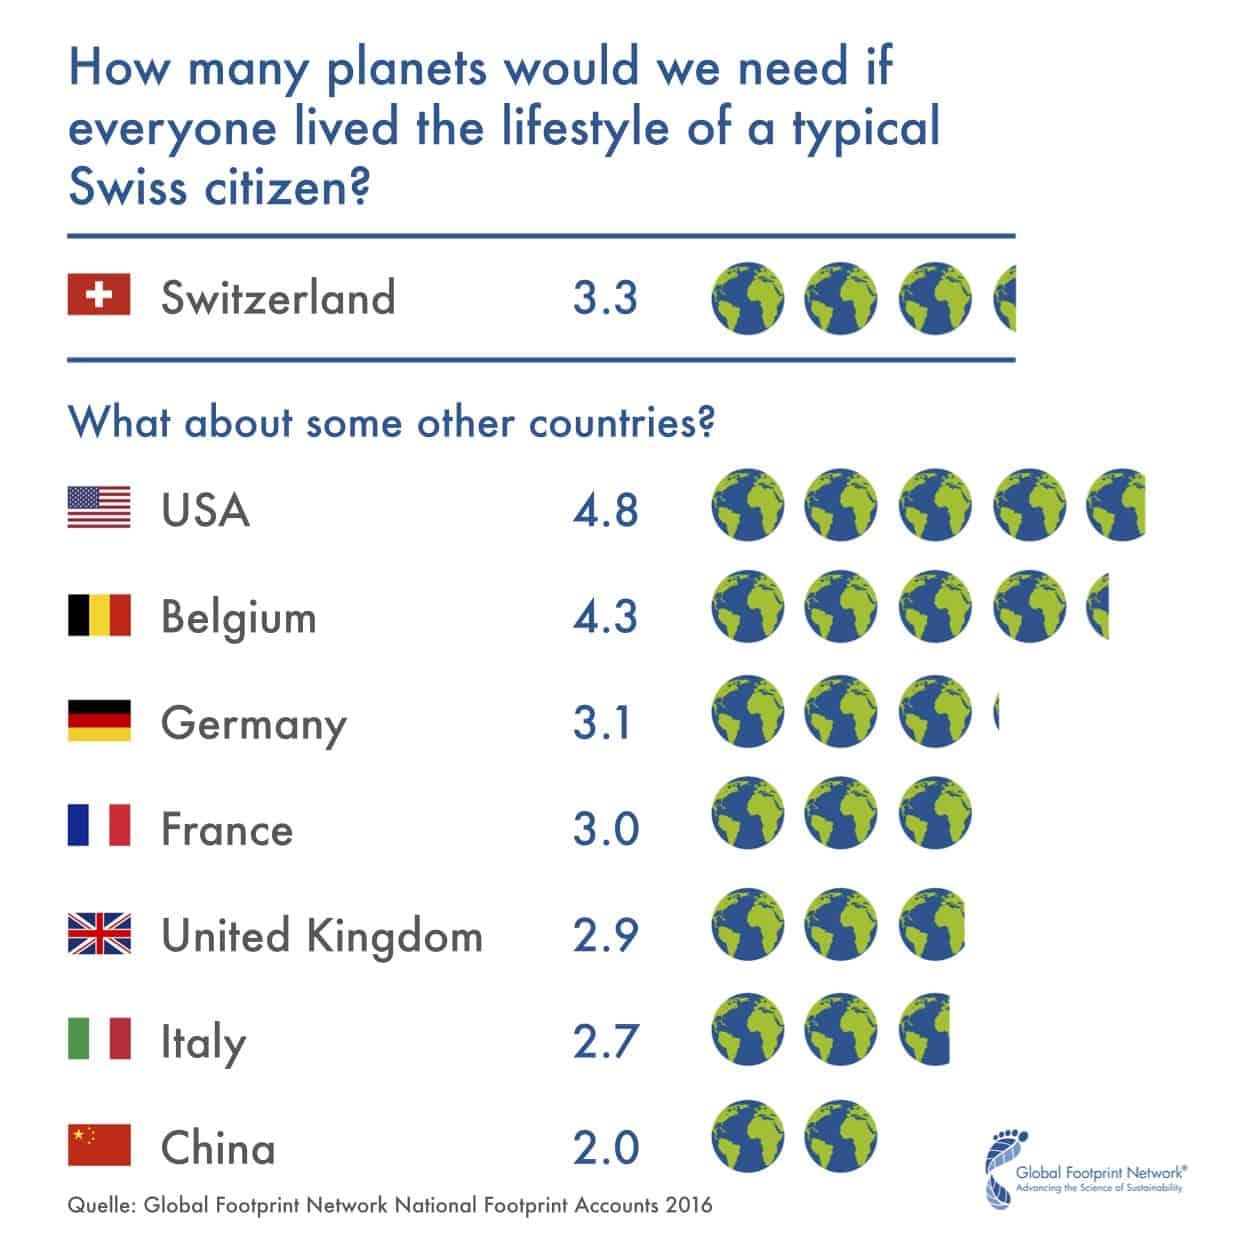 Swiss earth consumption